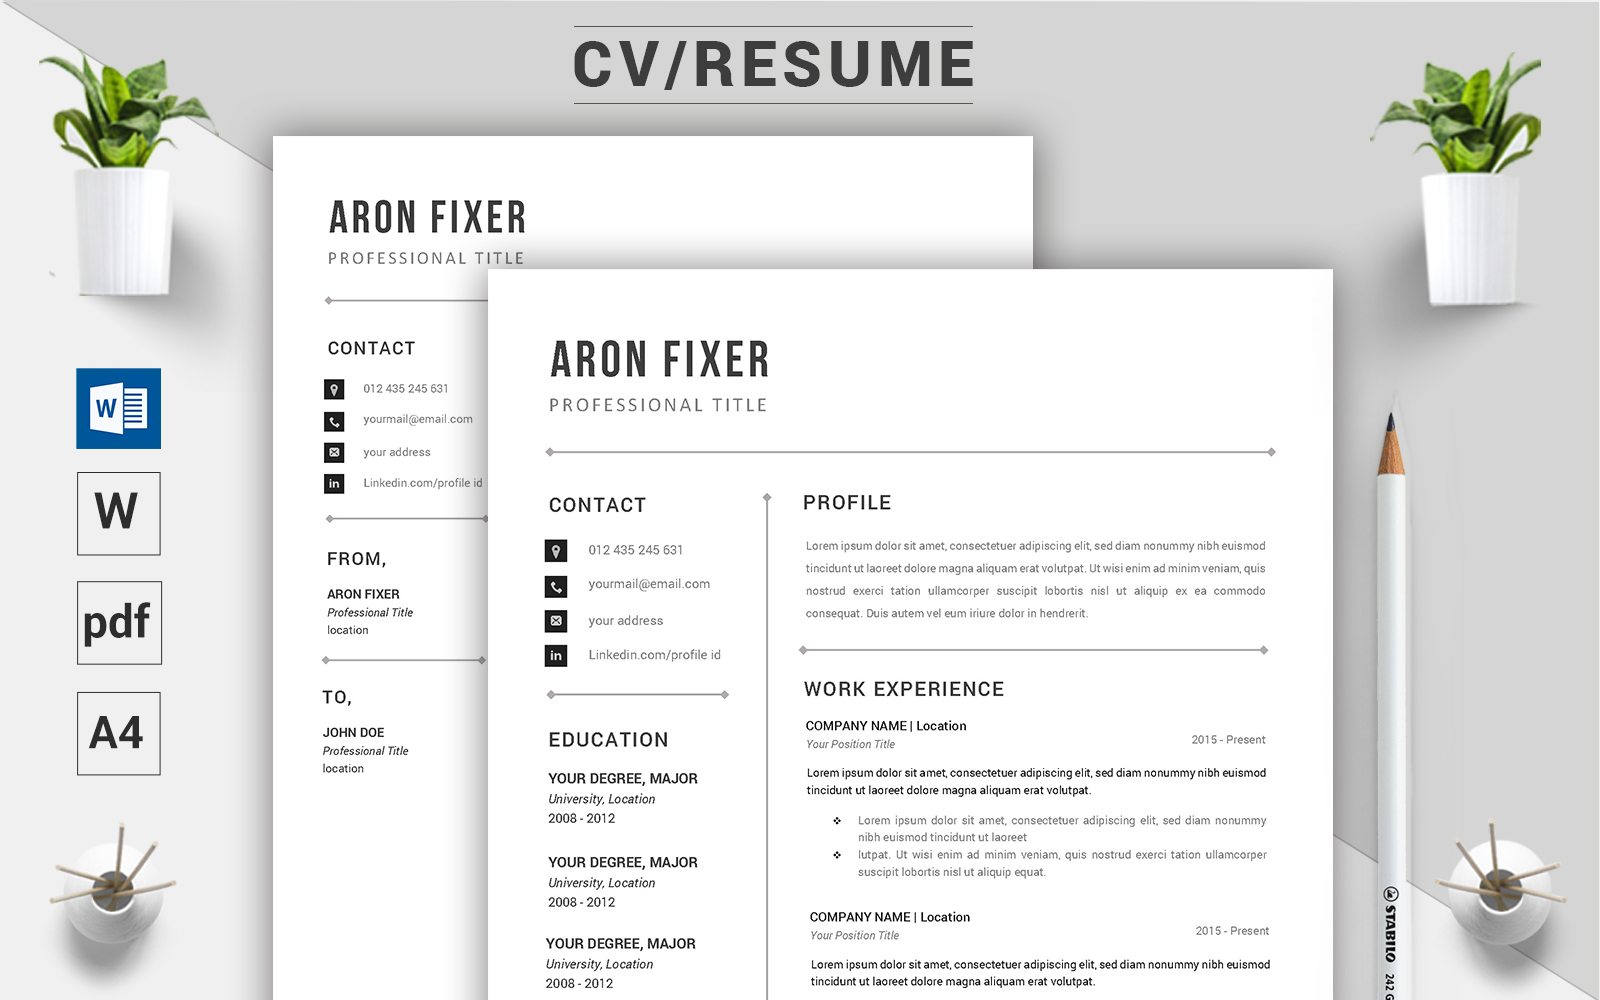 """Aron Fixer - CV"" modèle de CV Premium #124500"